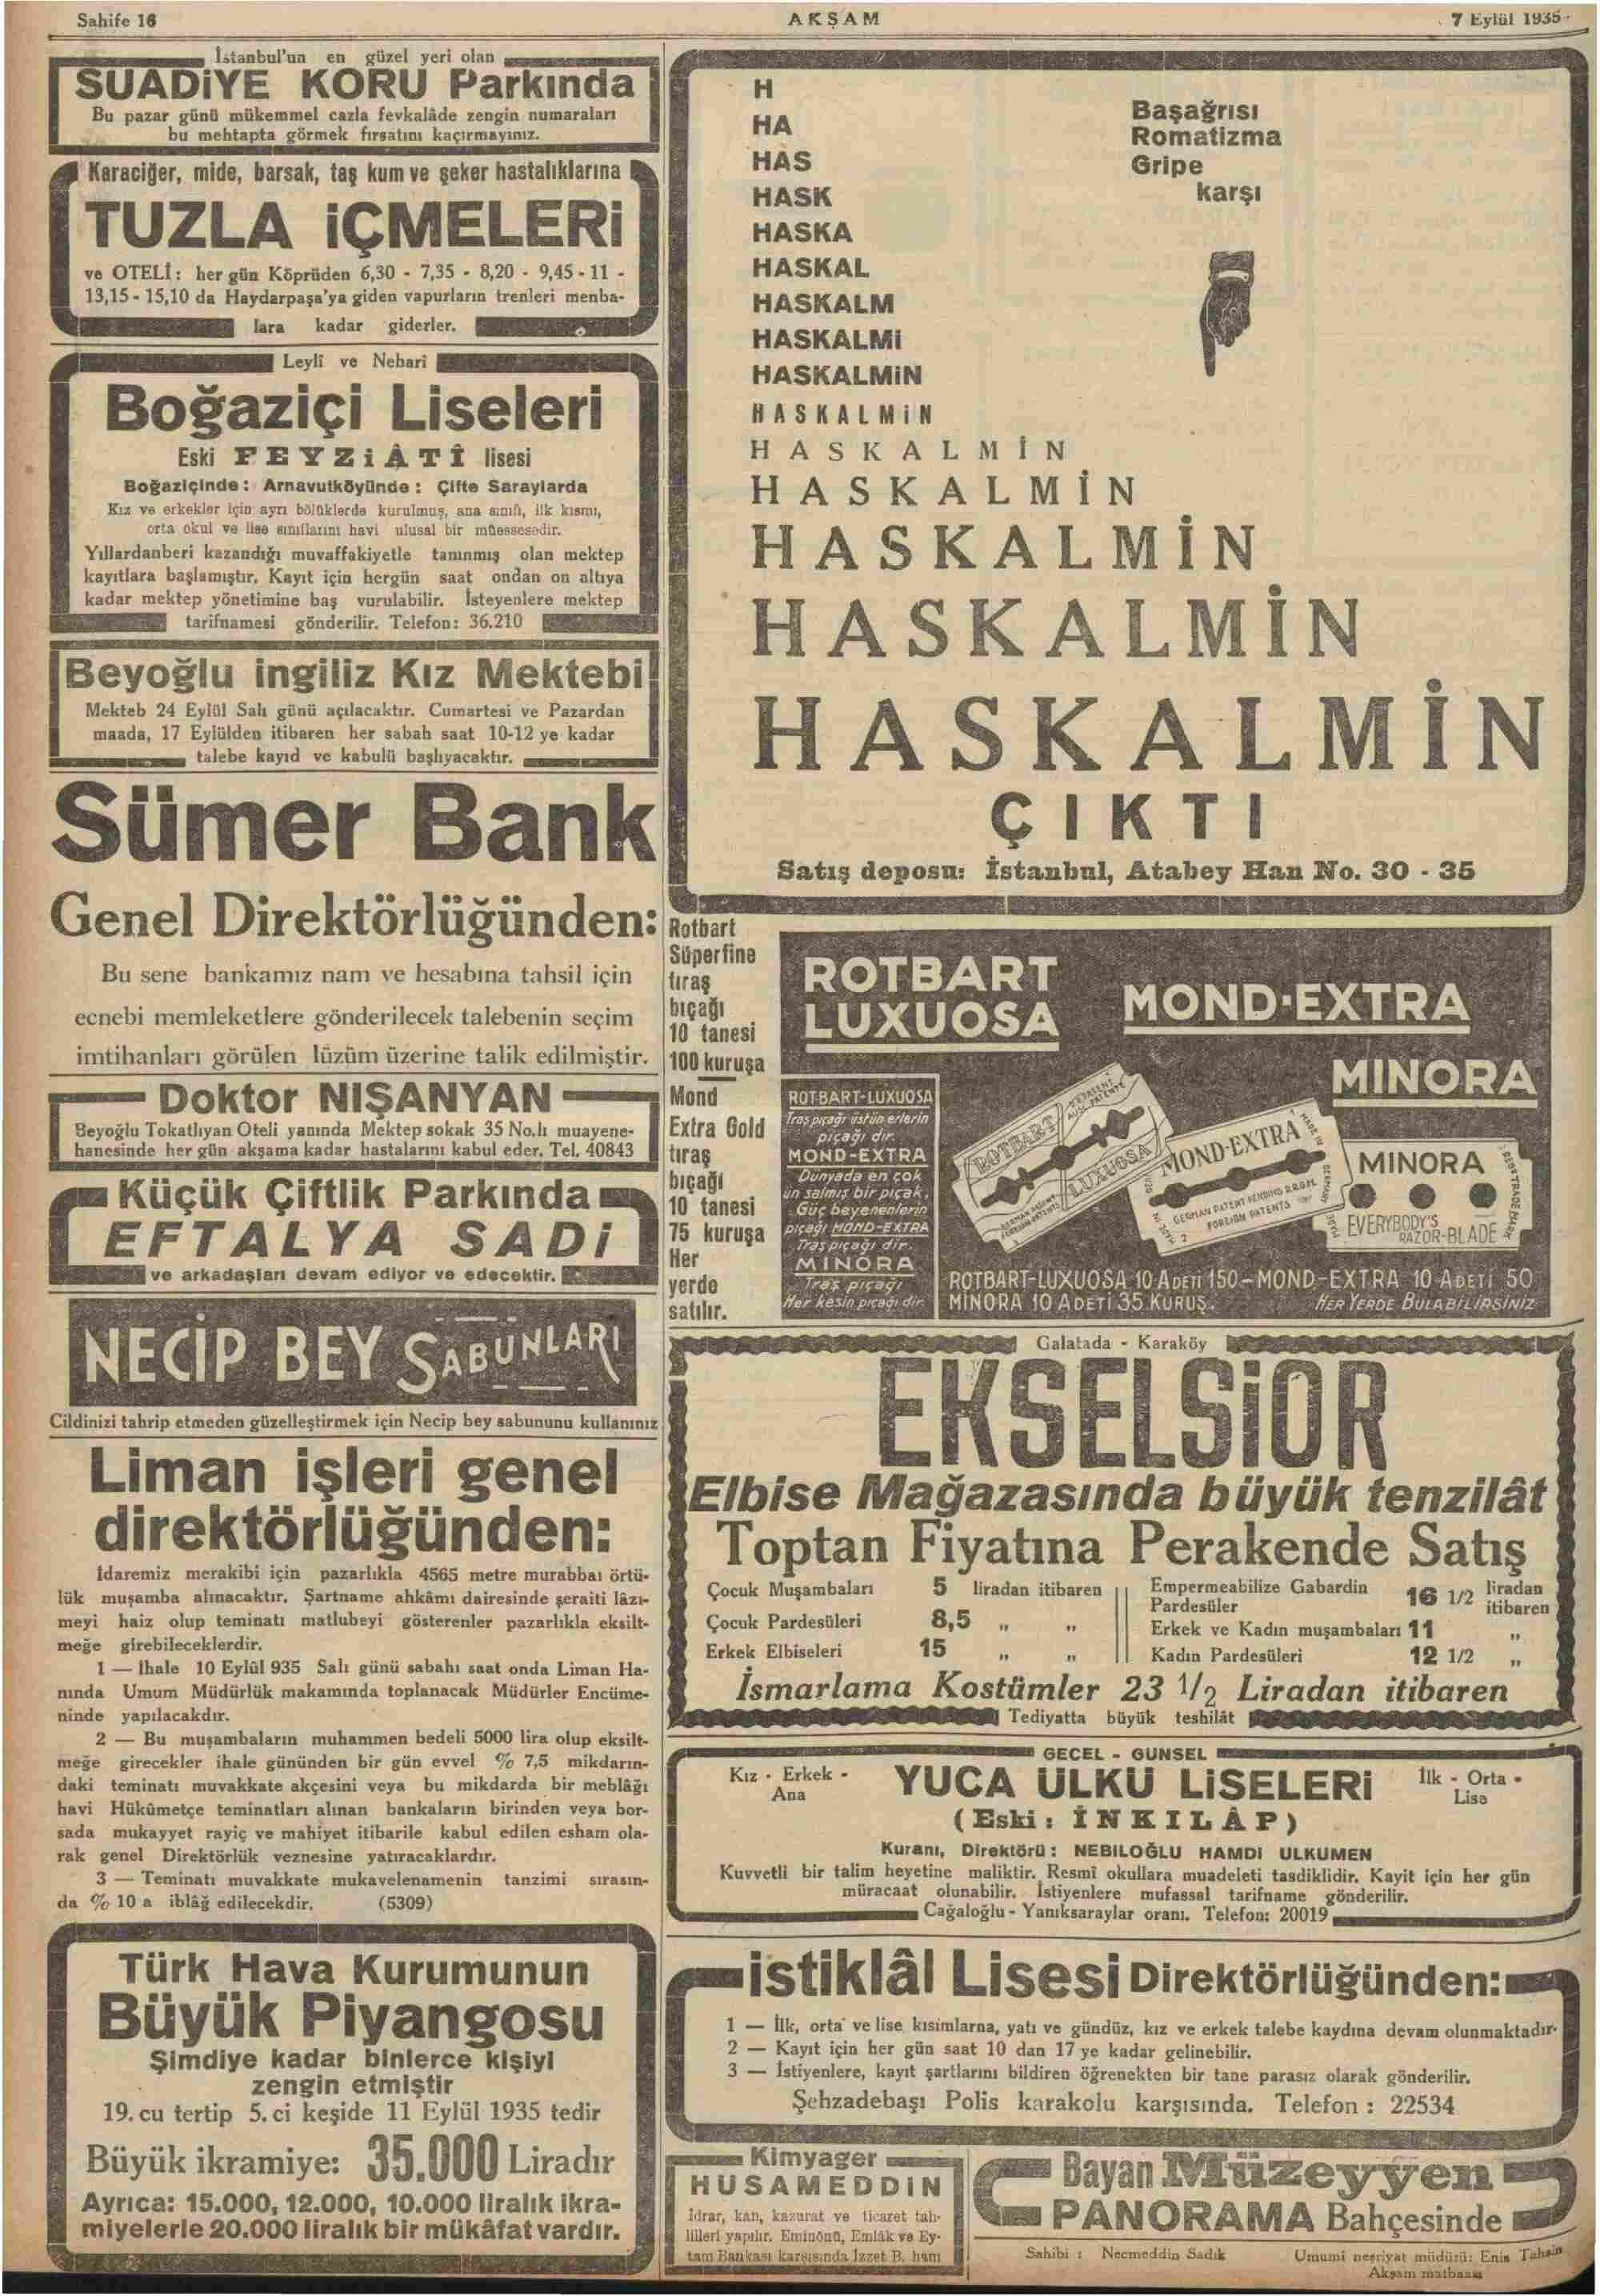 7 Eylül 1935 Tarihli Akşam Dergisi Sayfa 16